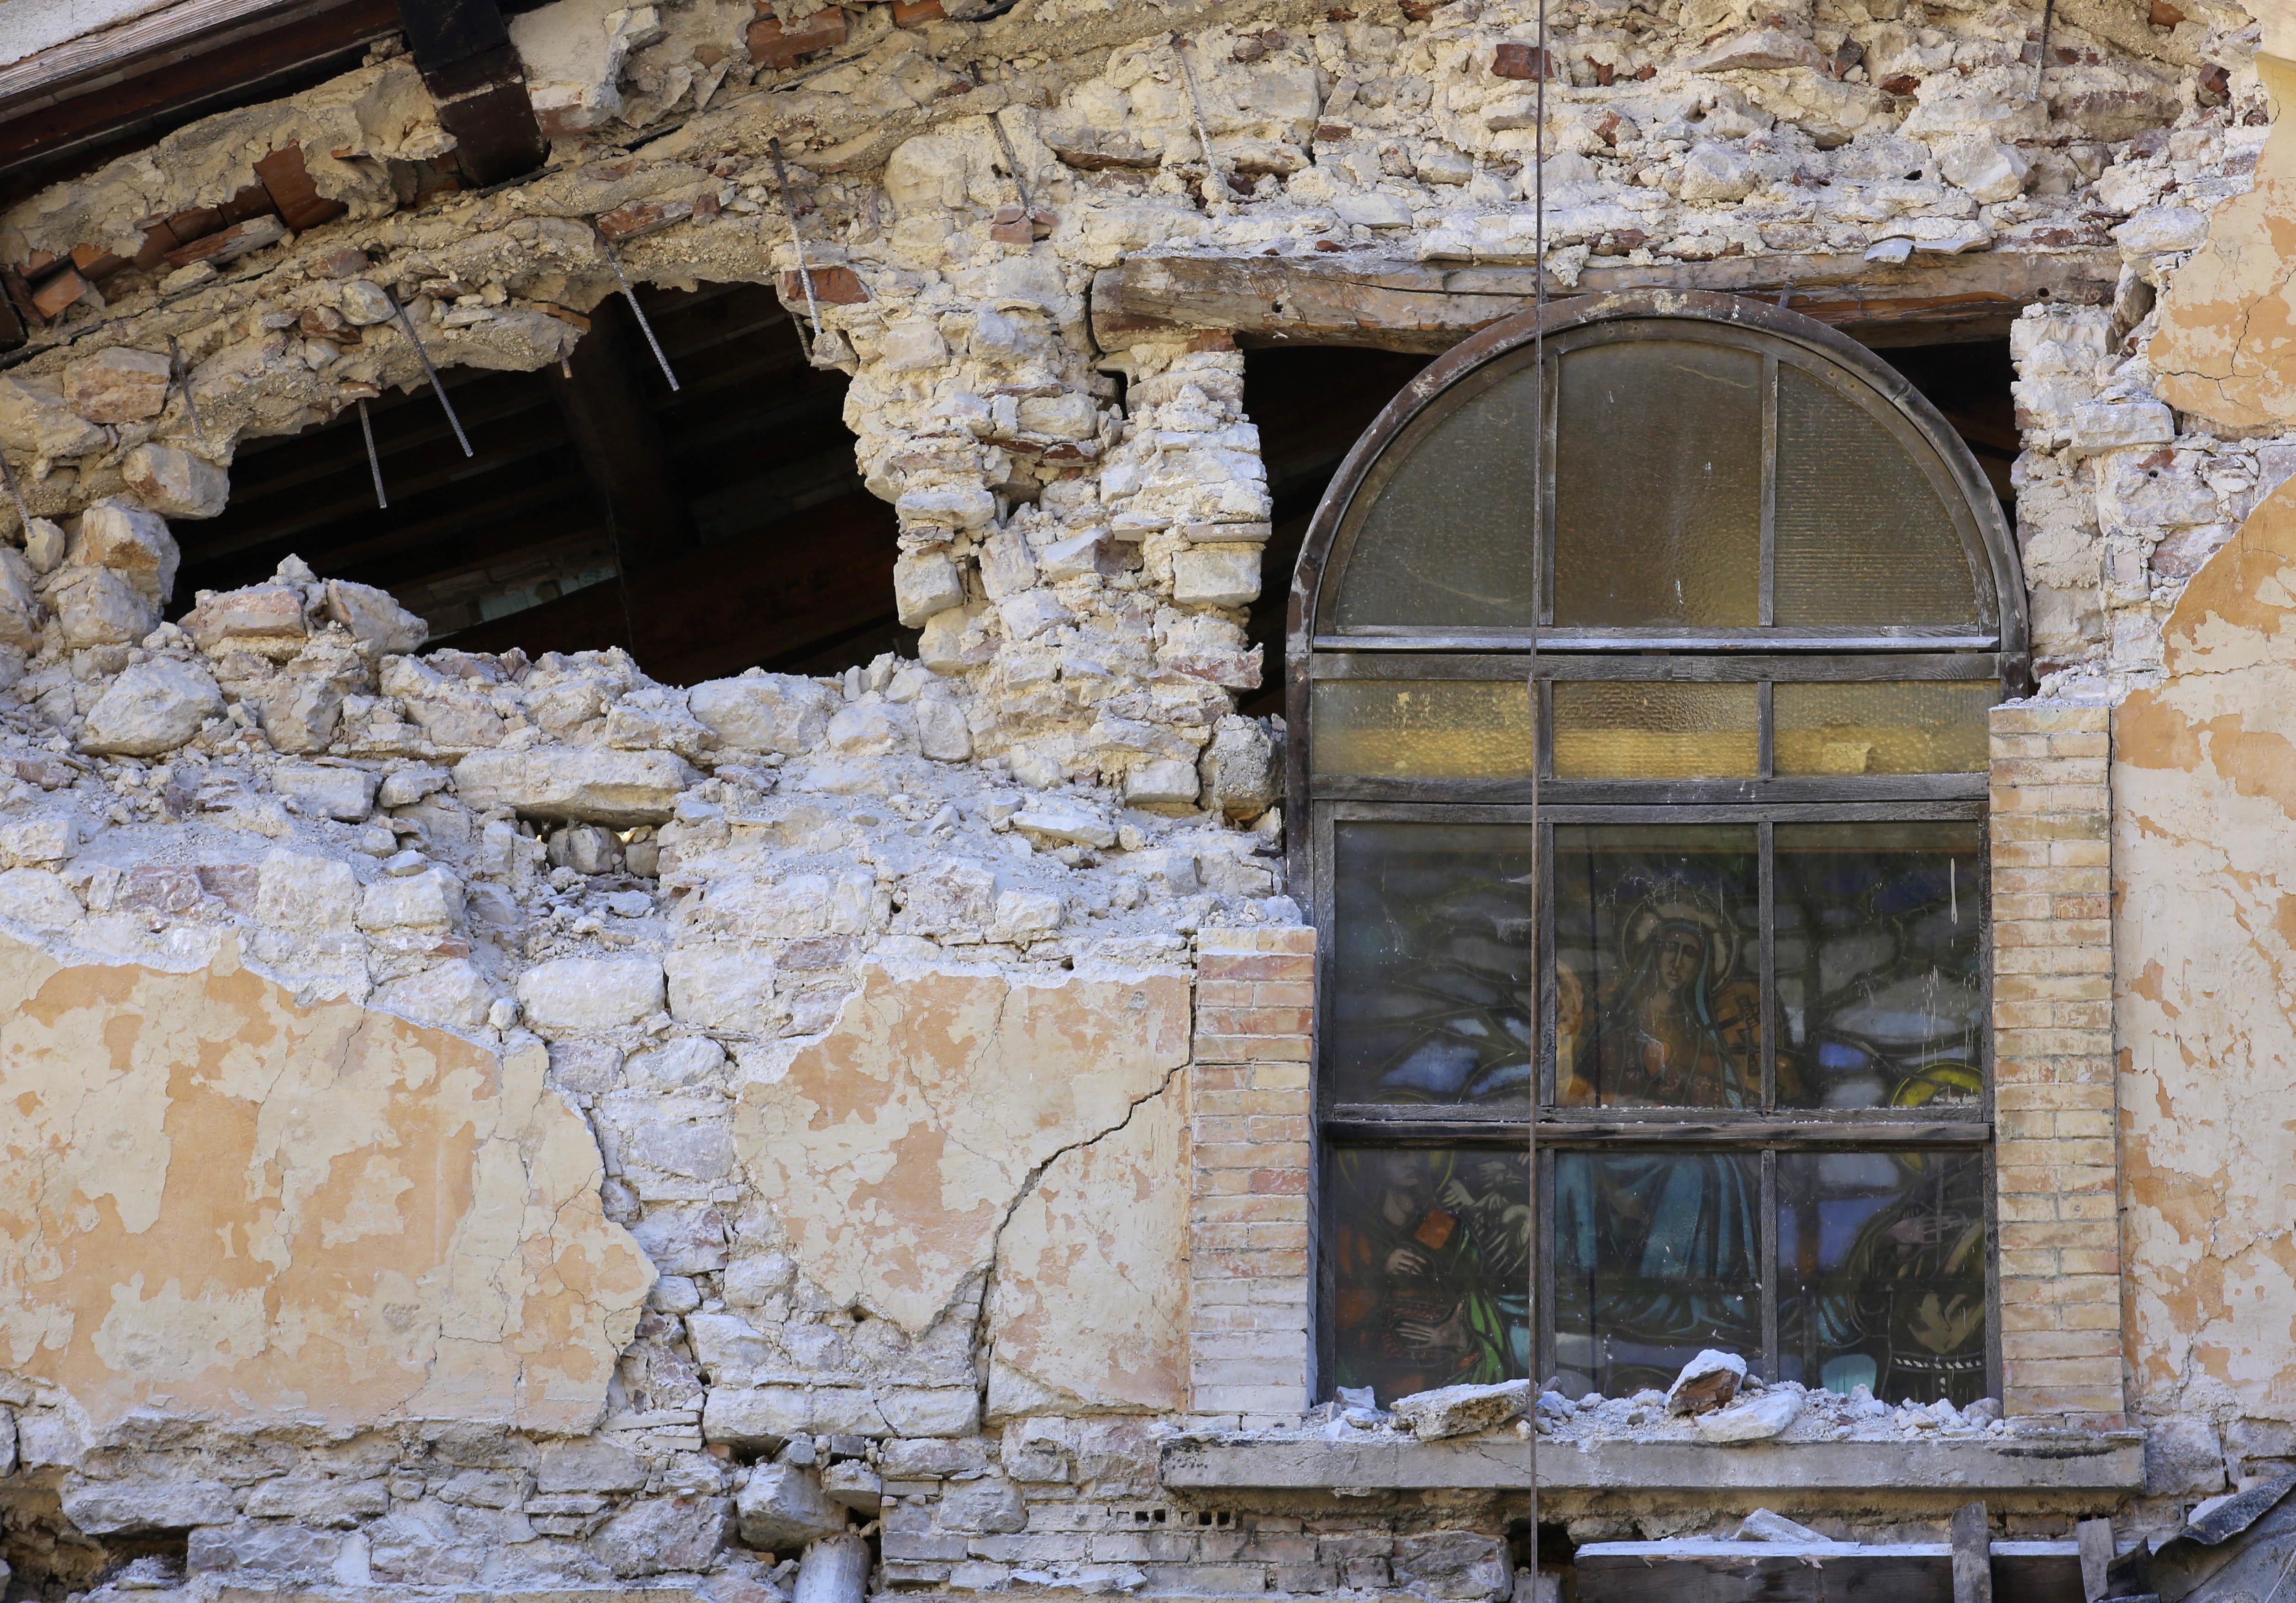 Approvato dal Cdm il decreto sisma